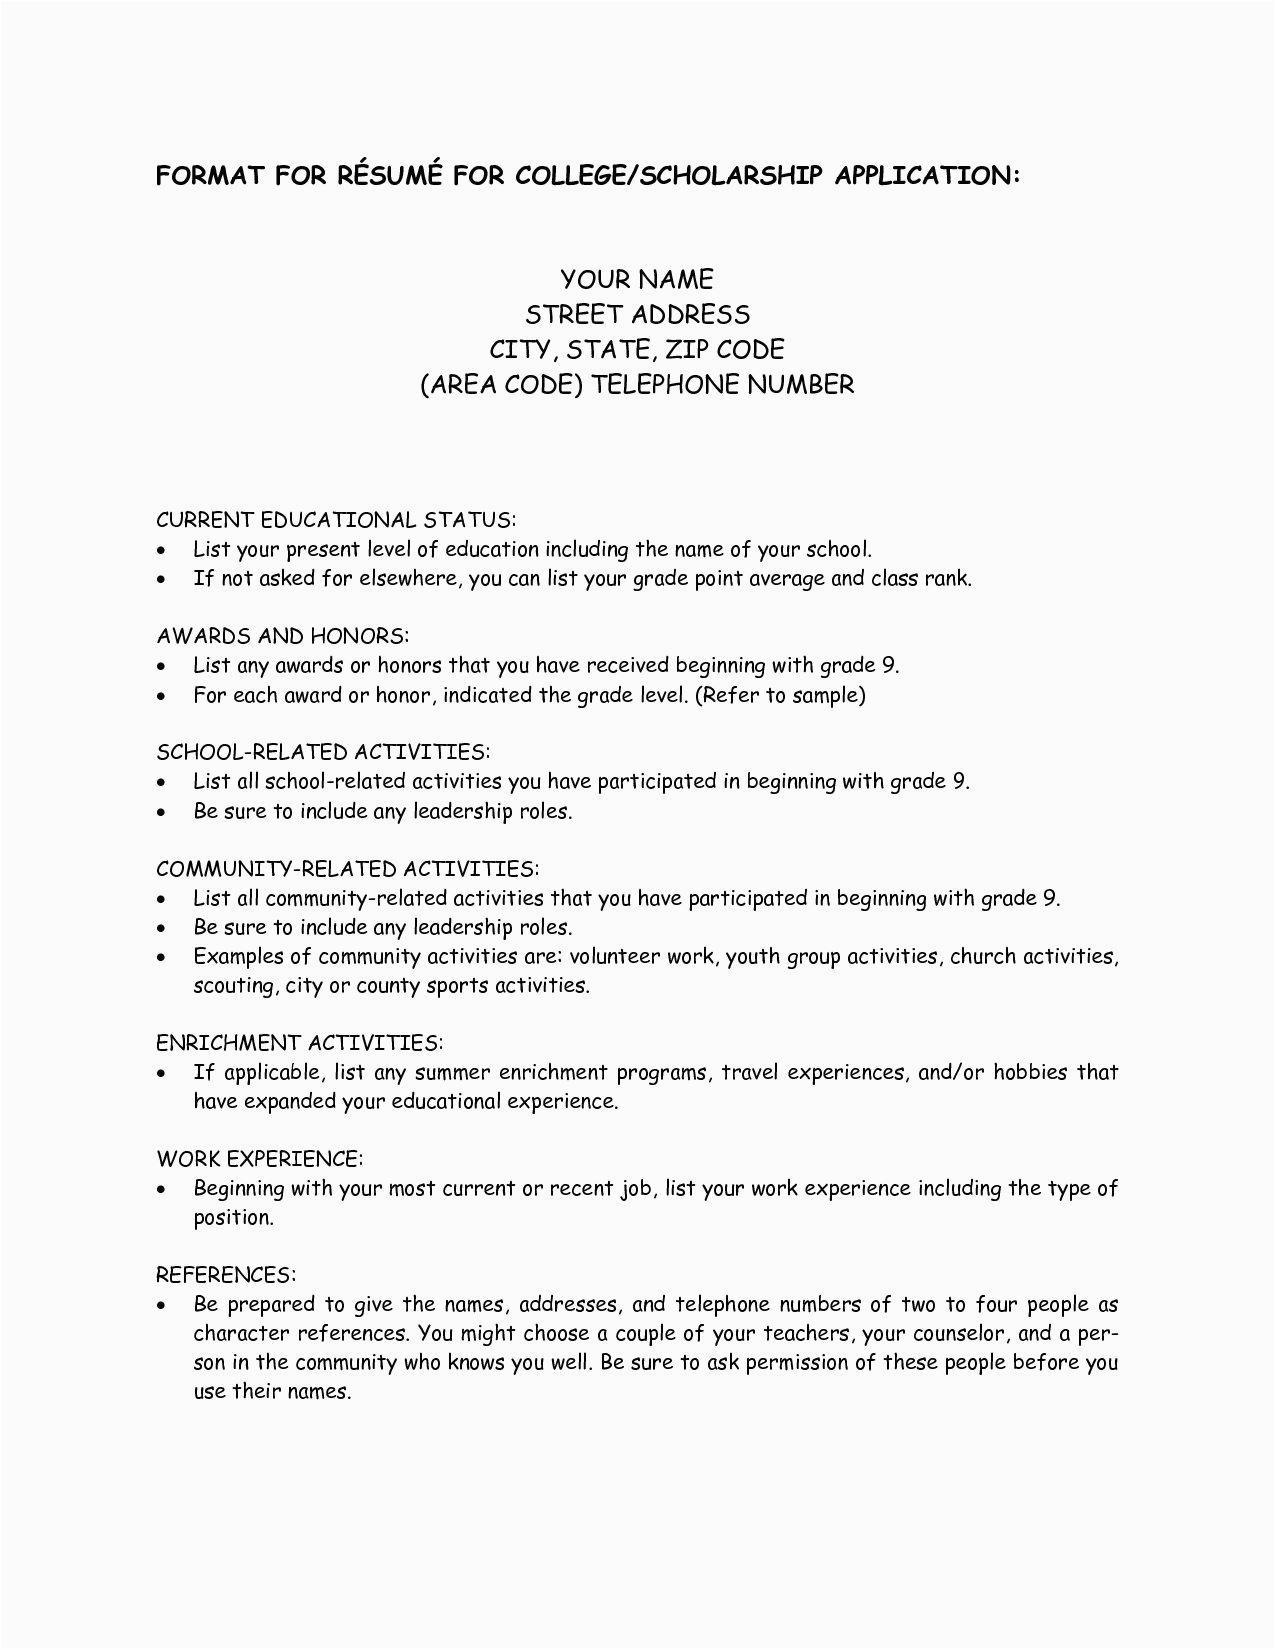 Sample Resume for College Scholarship Application College Scholarship Resume Template 1197